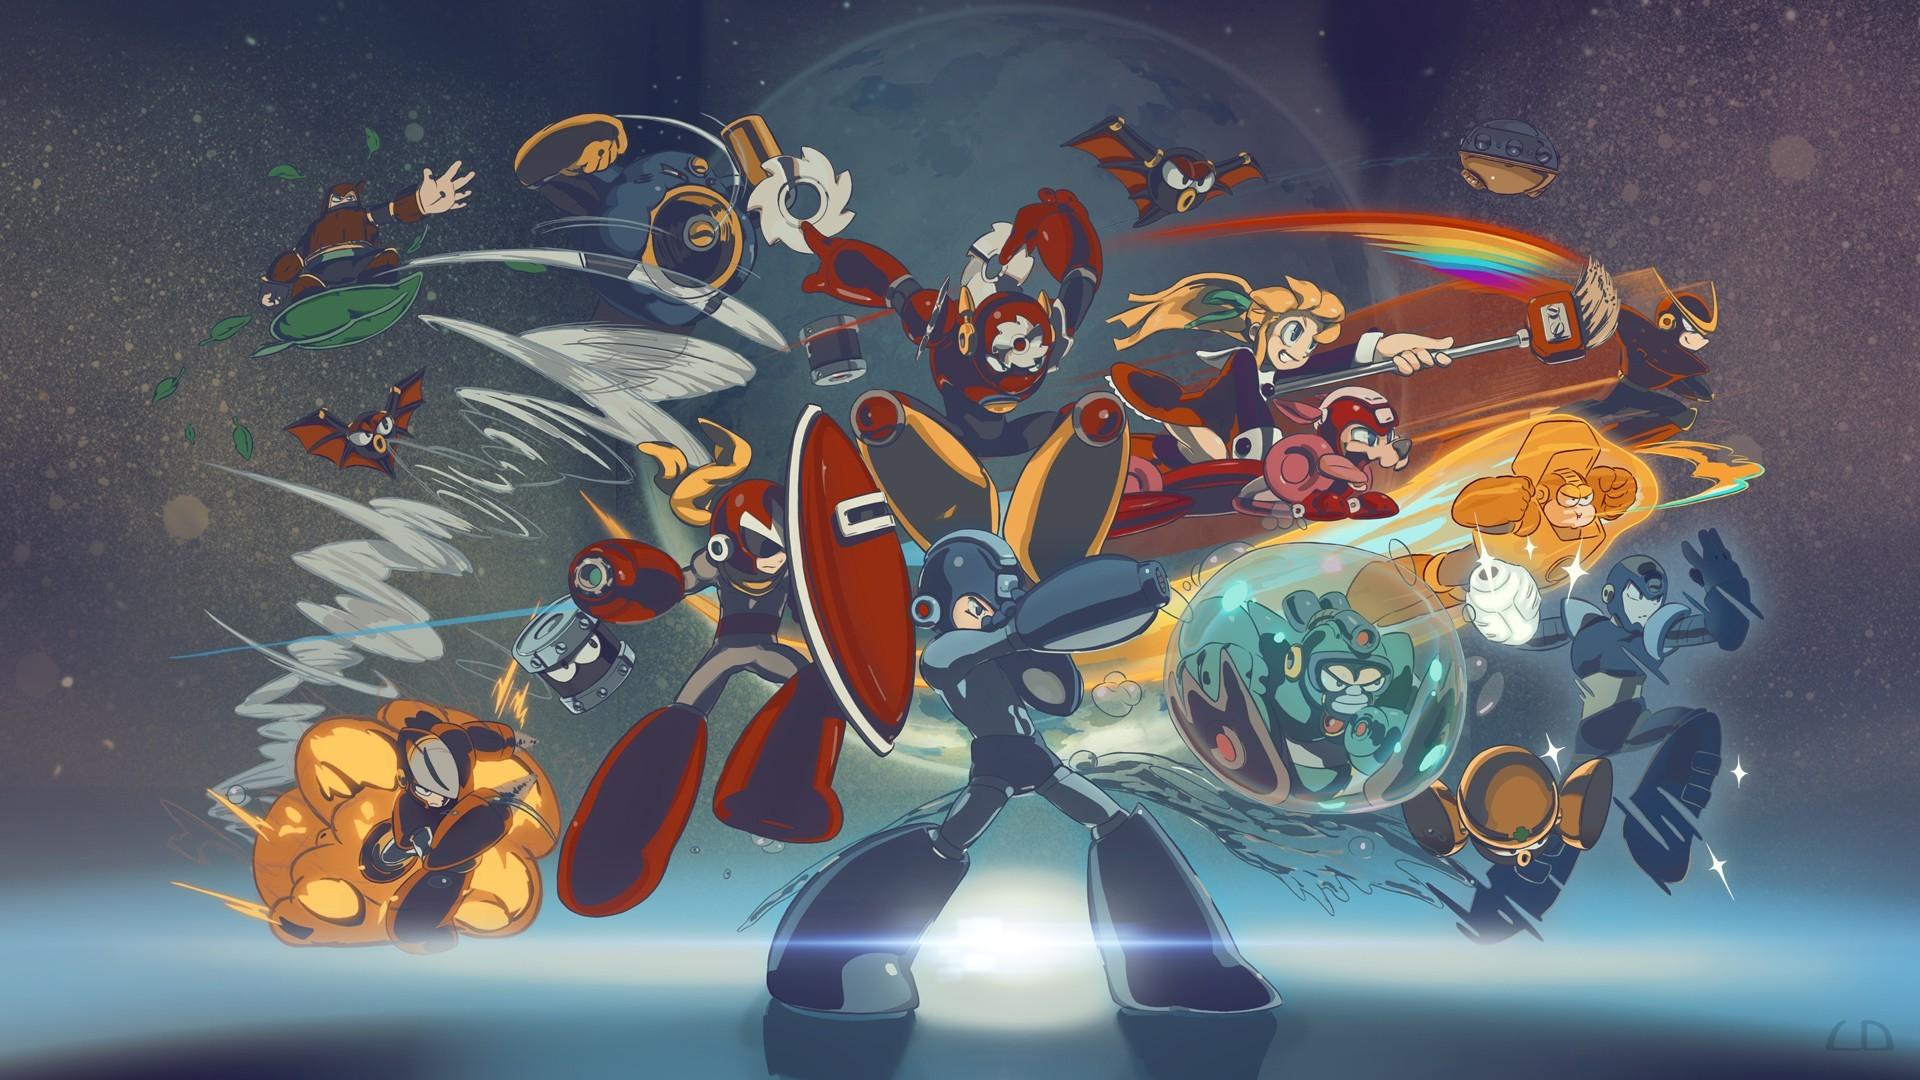 Megaman Wallpaper HD Free Download.